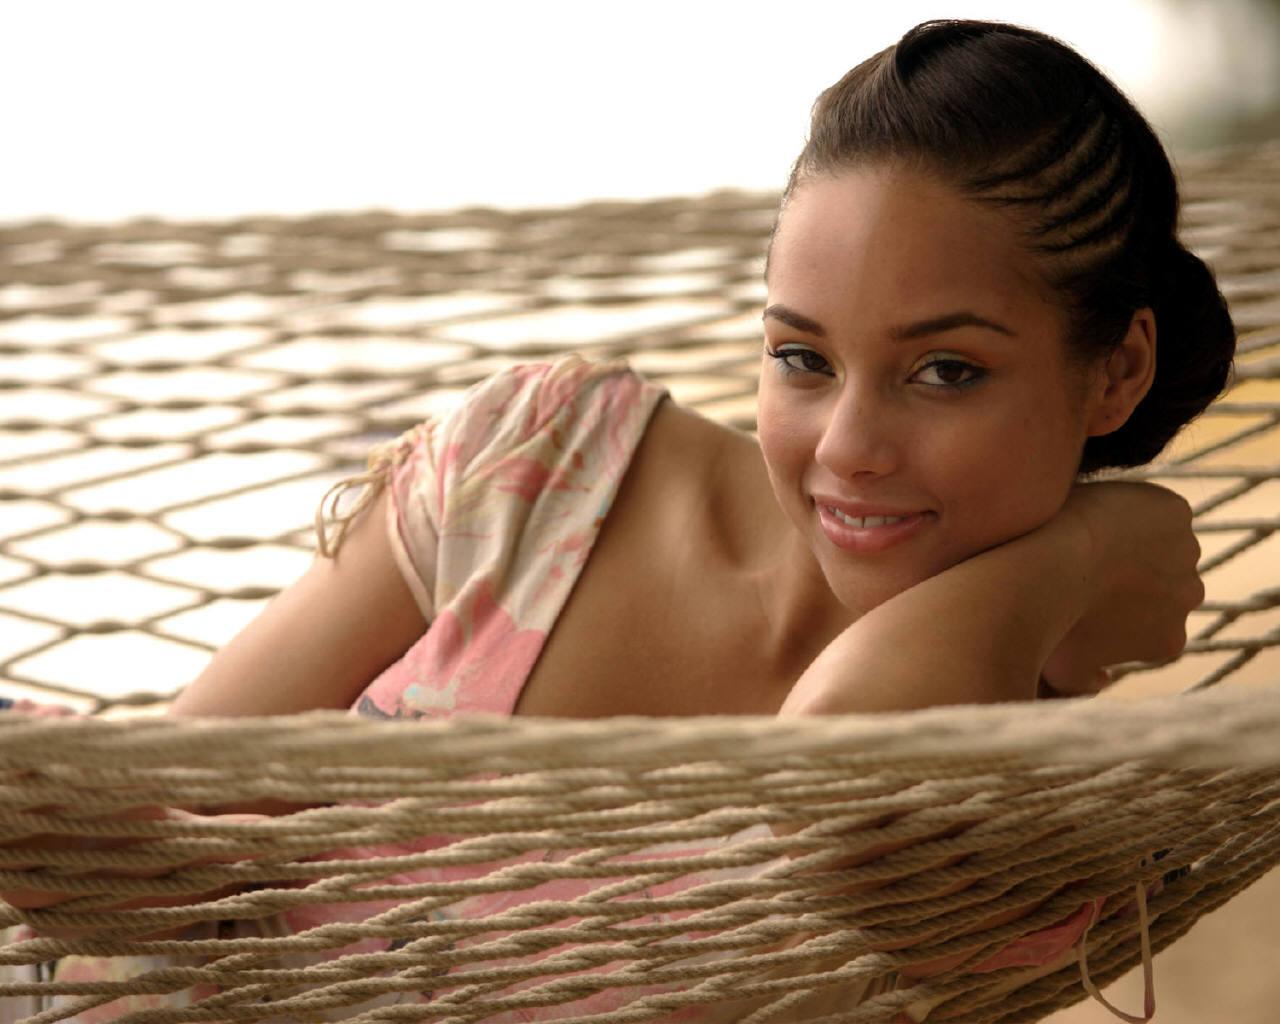 Alicia Keys Alicia-Keys-alicia-keys-432001_1280_1024